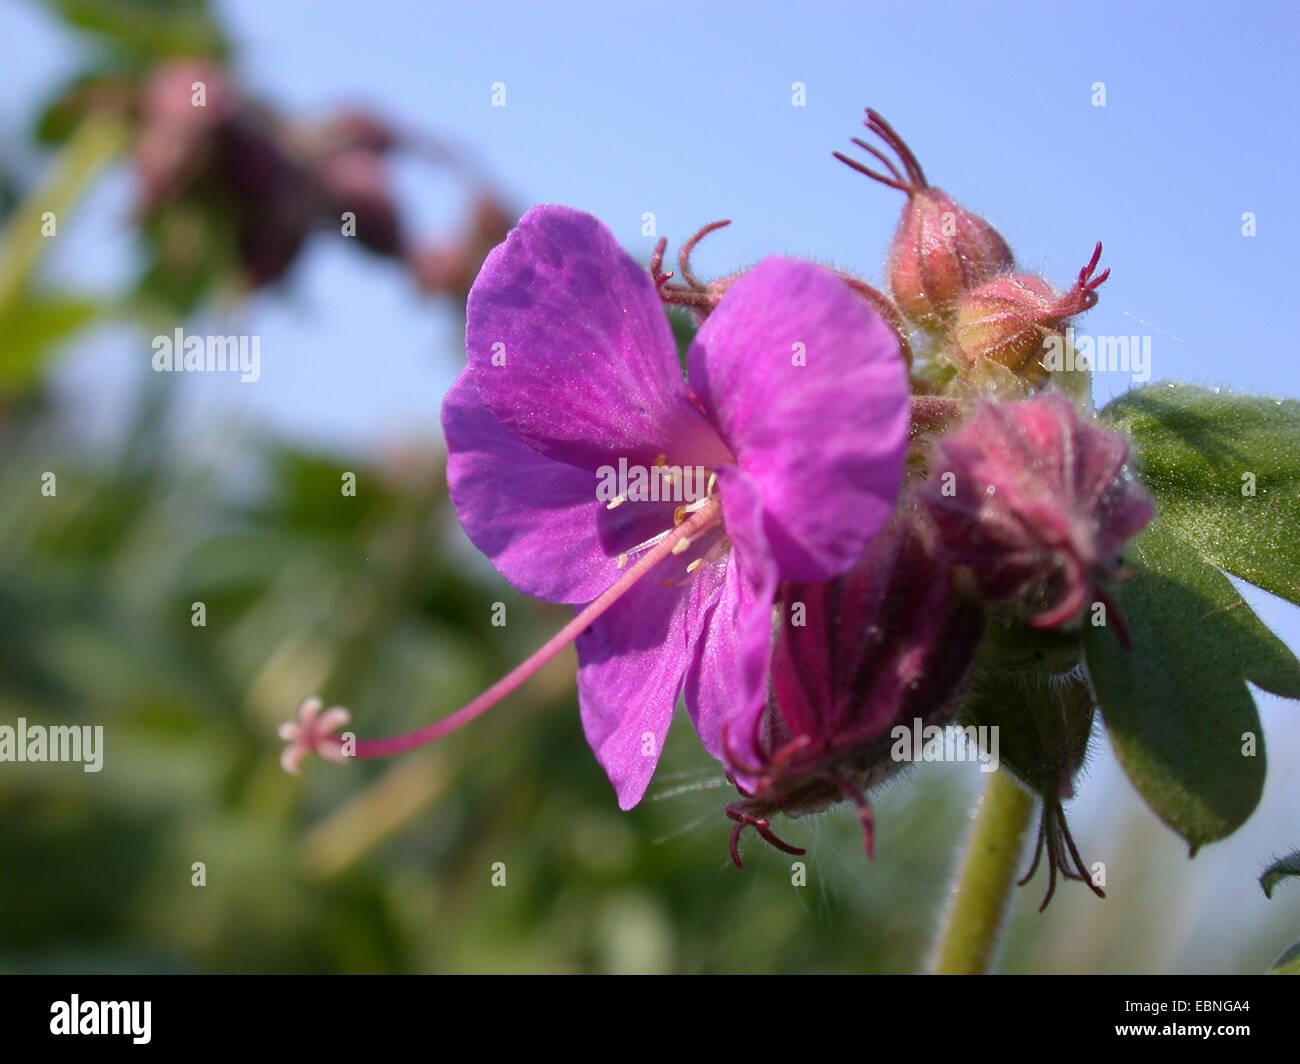 Rock cranesbill, Bigroot geranium, Bulgarian geranium, Zdravetz Rock crane's-bill (Geranium macrorrhizum), flower, - Stock Image